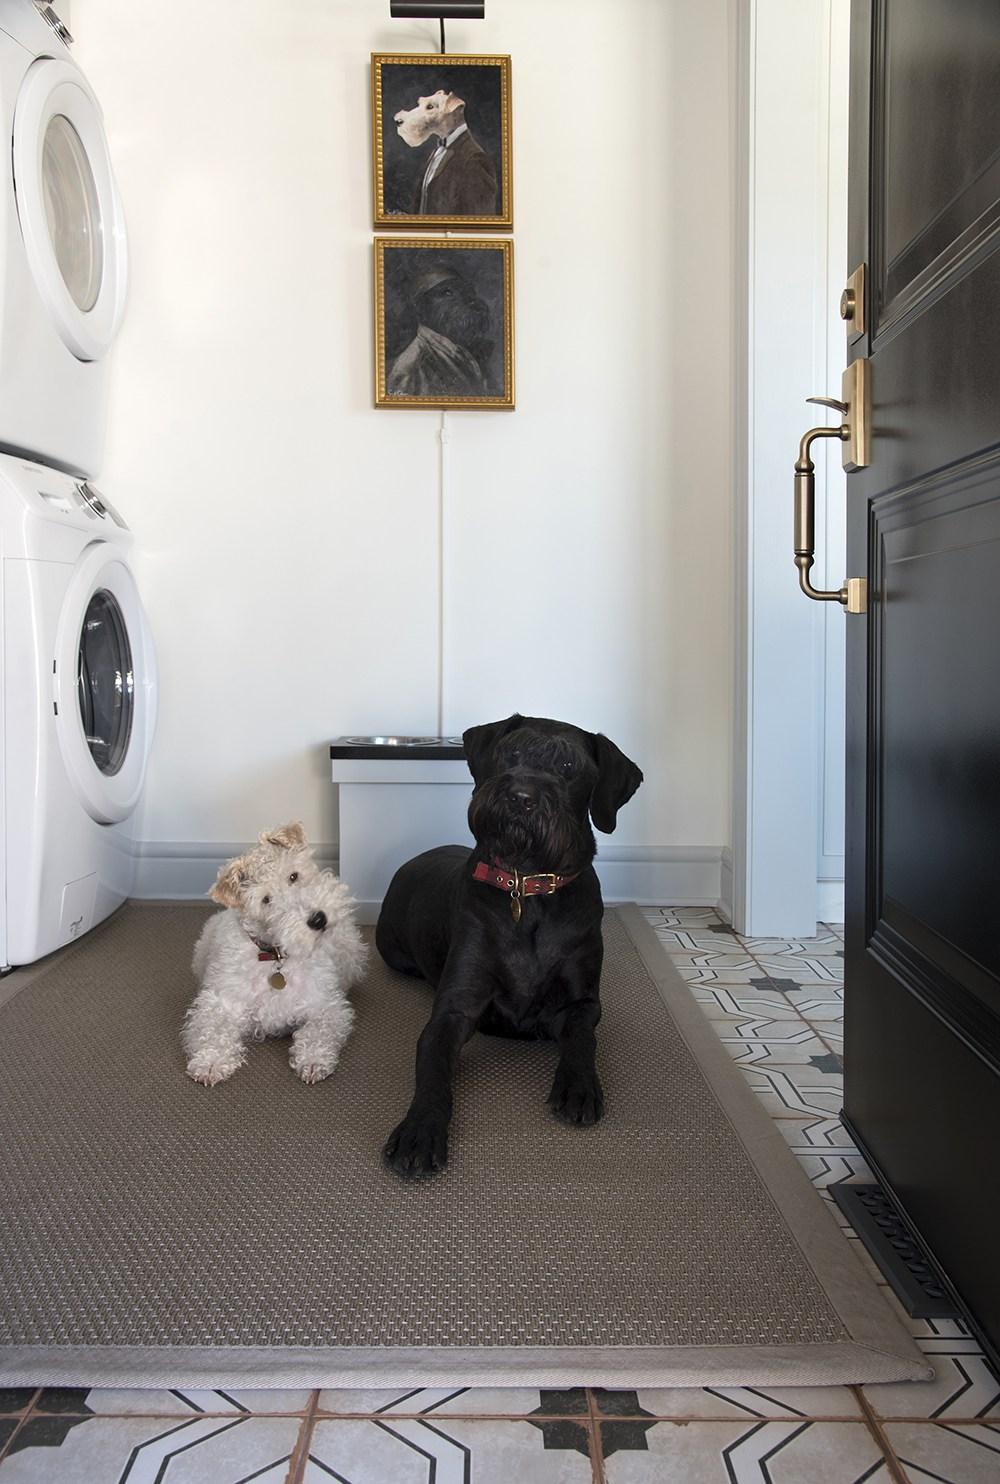 Dogs-In-the-Mud-Room.jpg